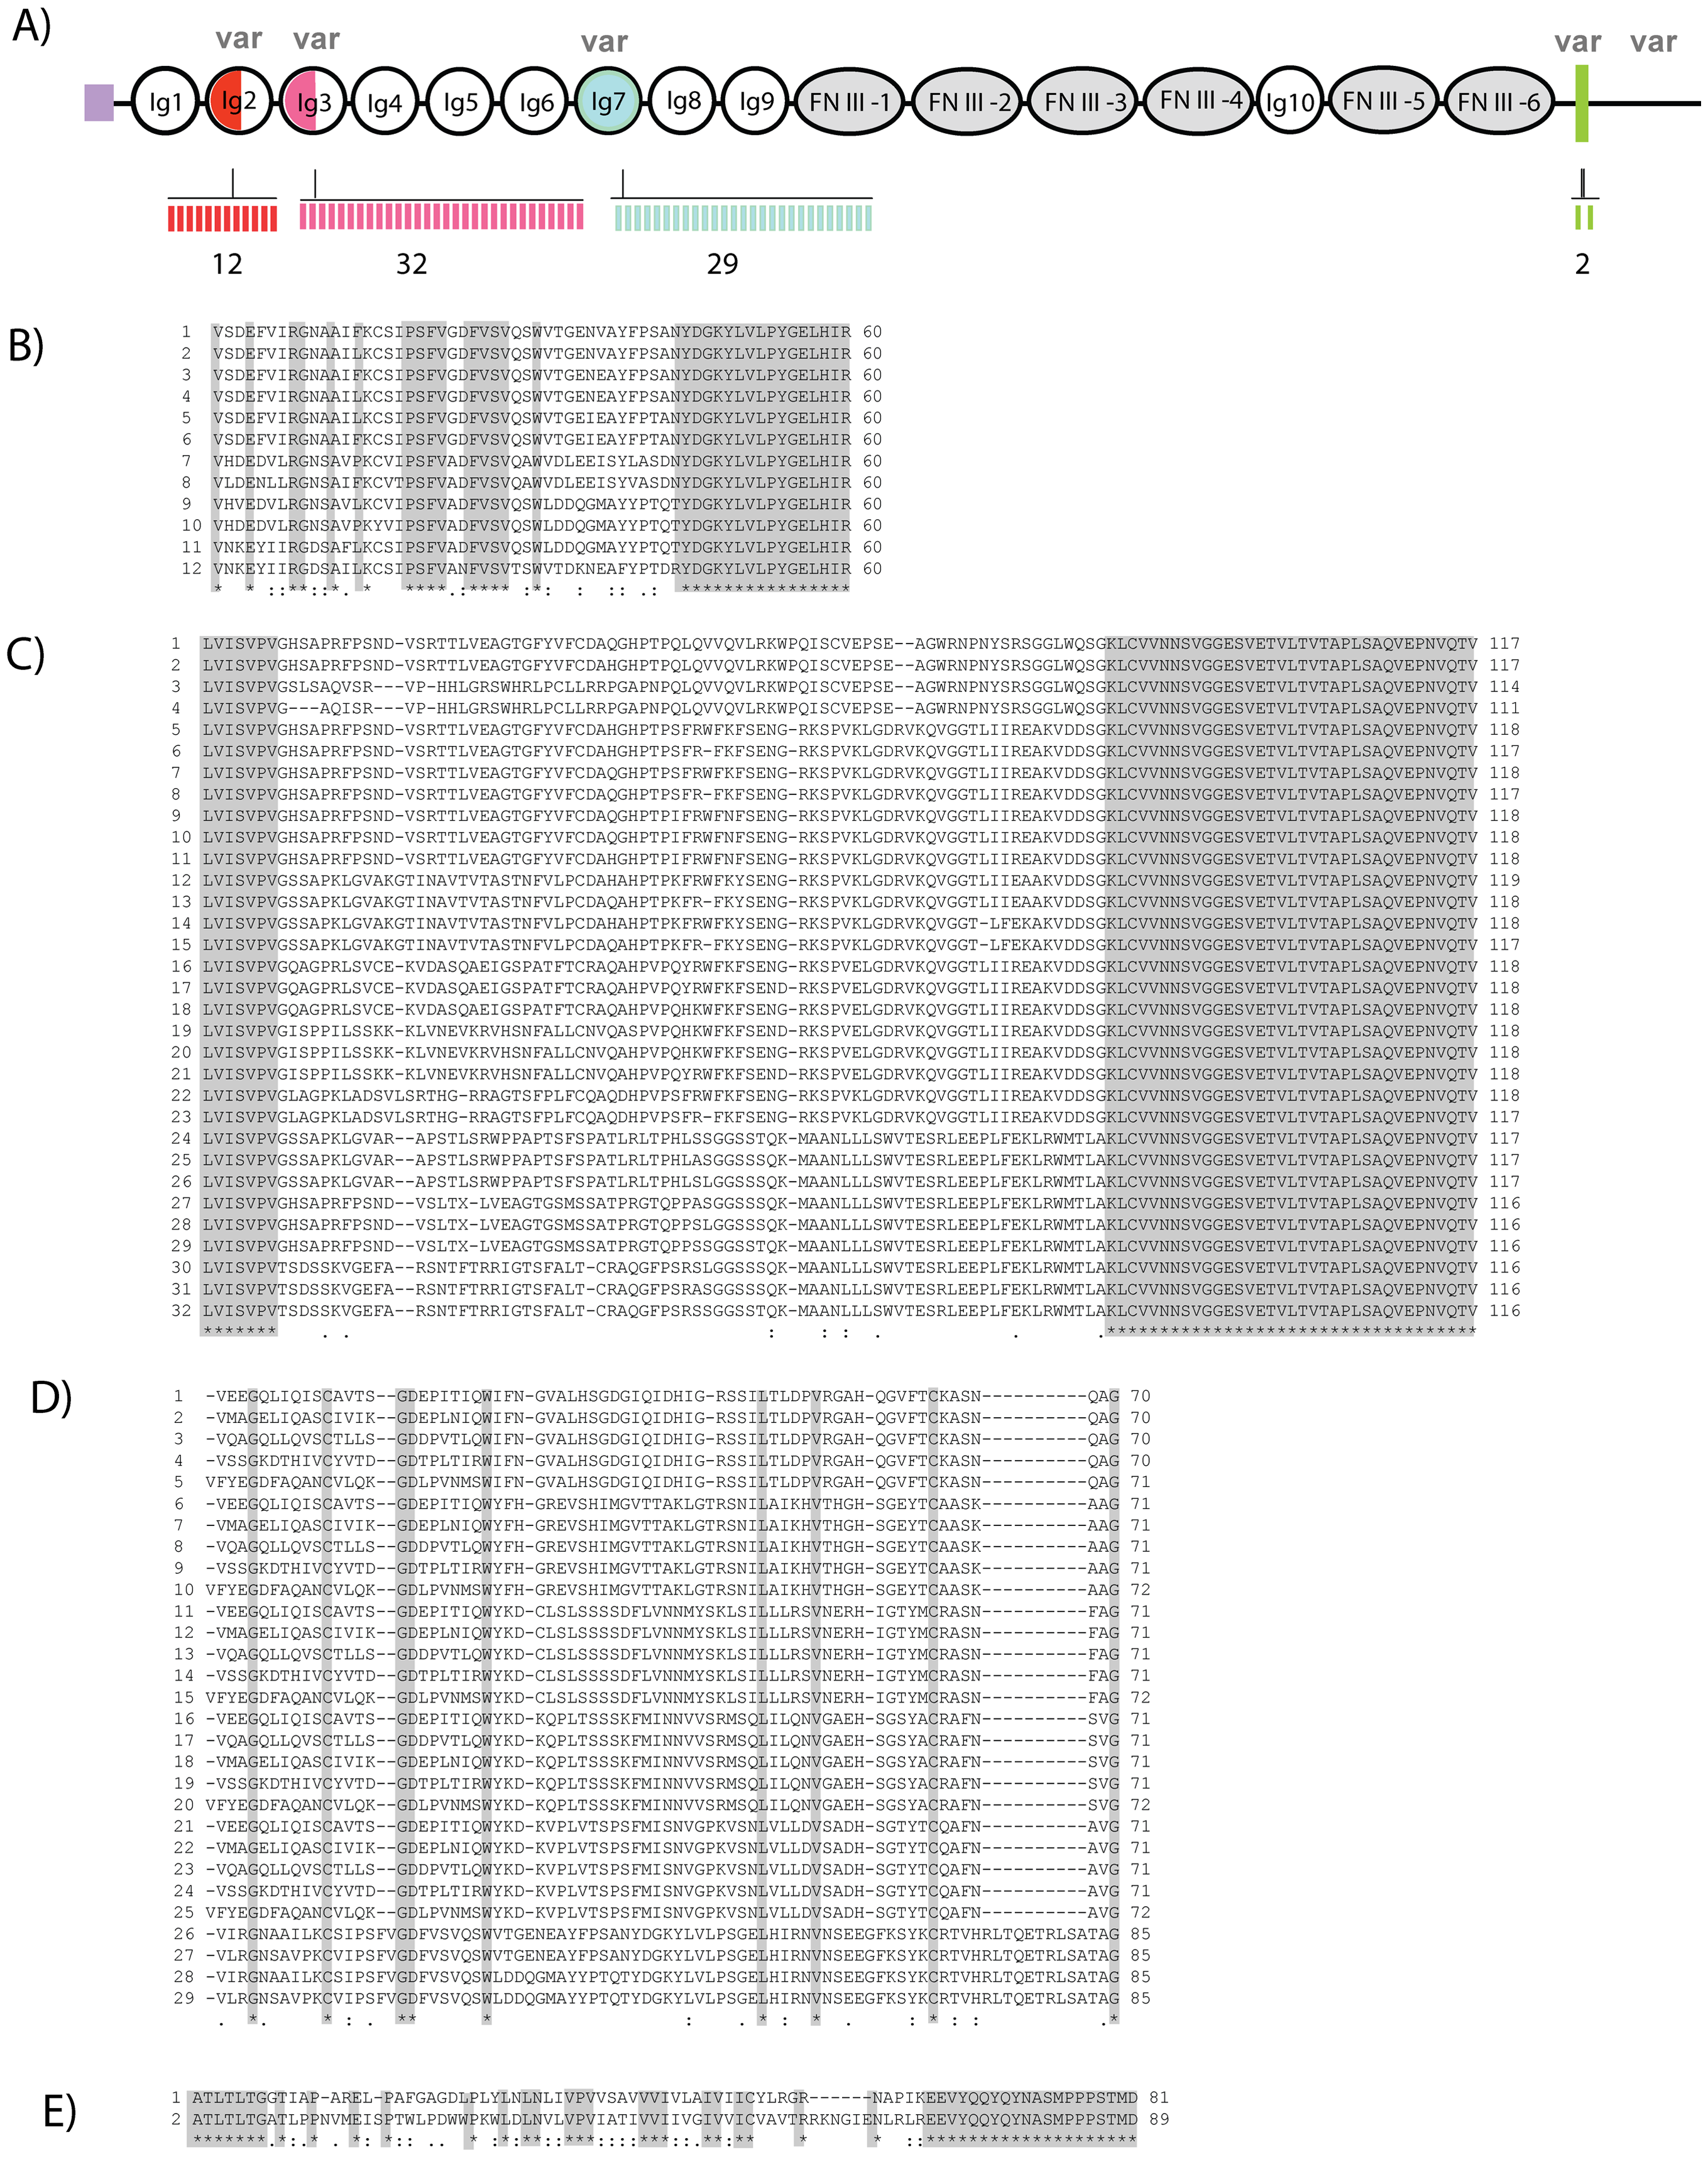 High diversity regions of Dscam in freshwater crayfish.